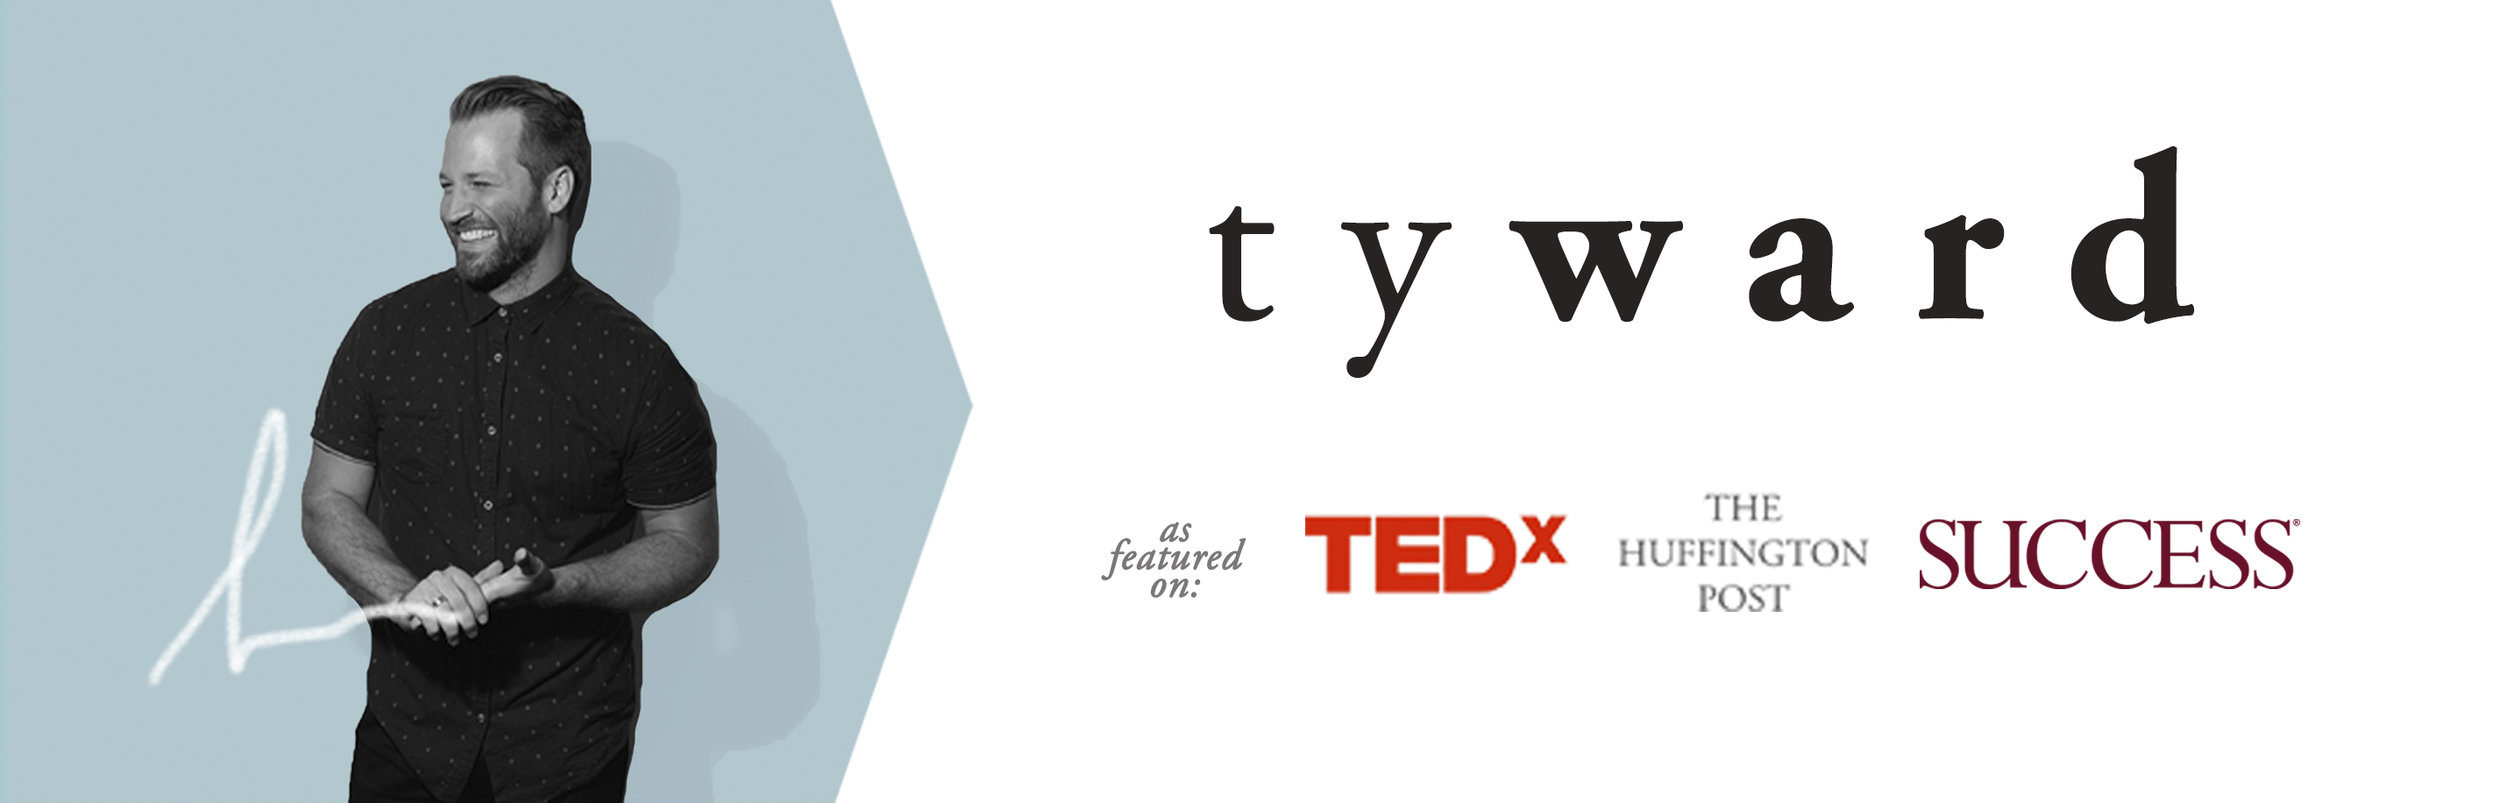 tywardco-logo-2.jpg